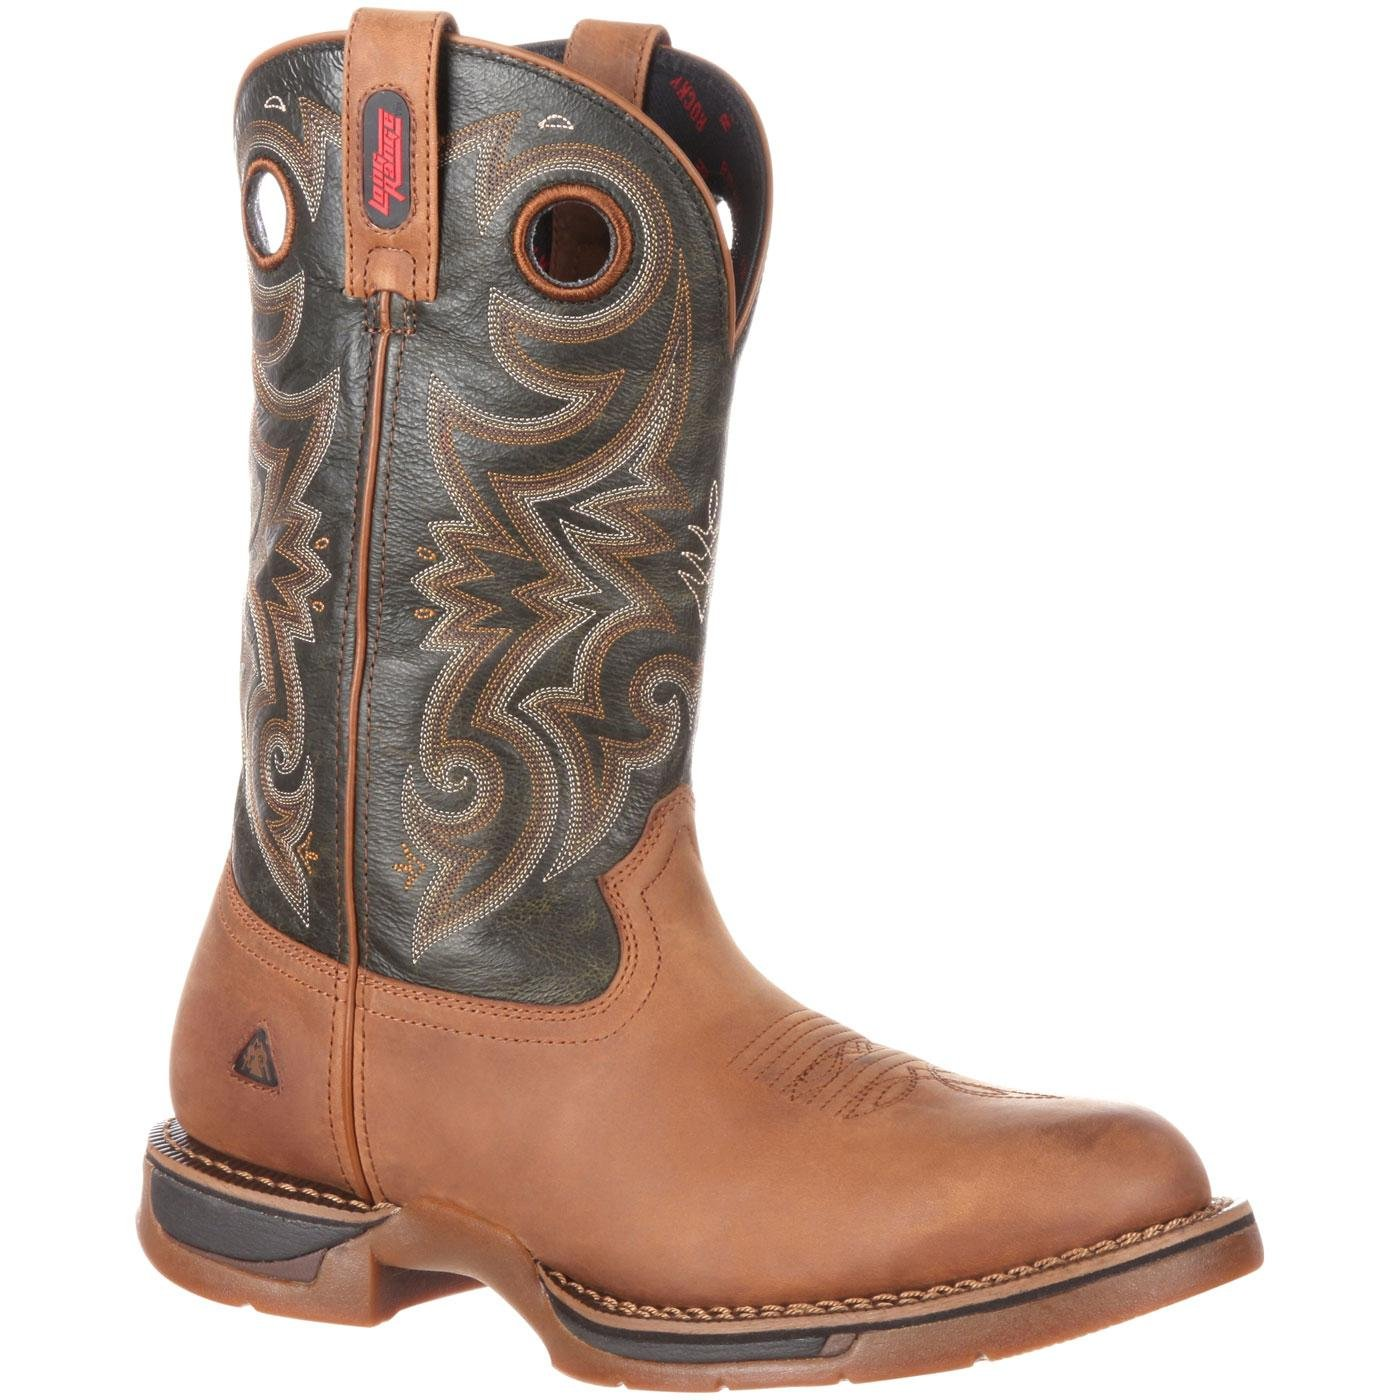 ROCKY Men's RKW0188 Western Boot, Dark Brown, 10 W US by ROCKY